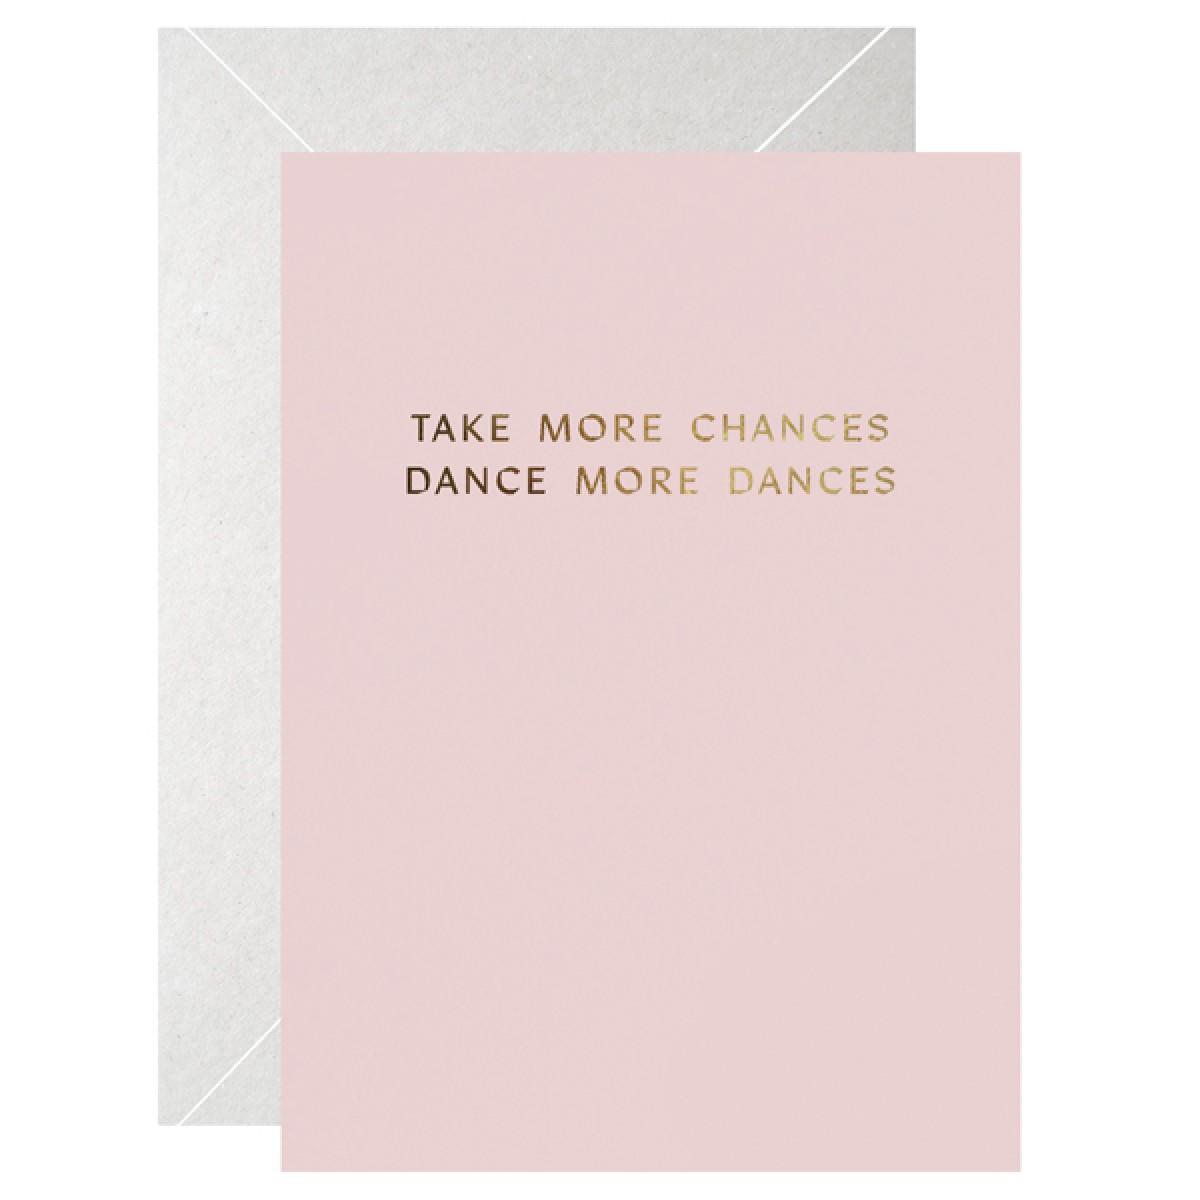 TAKE MORE CHANCES, DANCE MORE DANCES - A5 Print - Letterpress – Anna Cosma